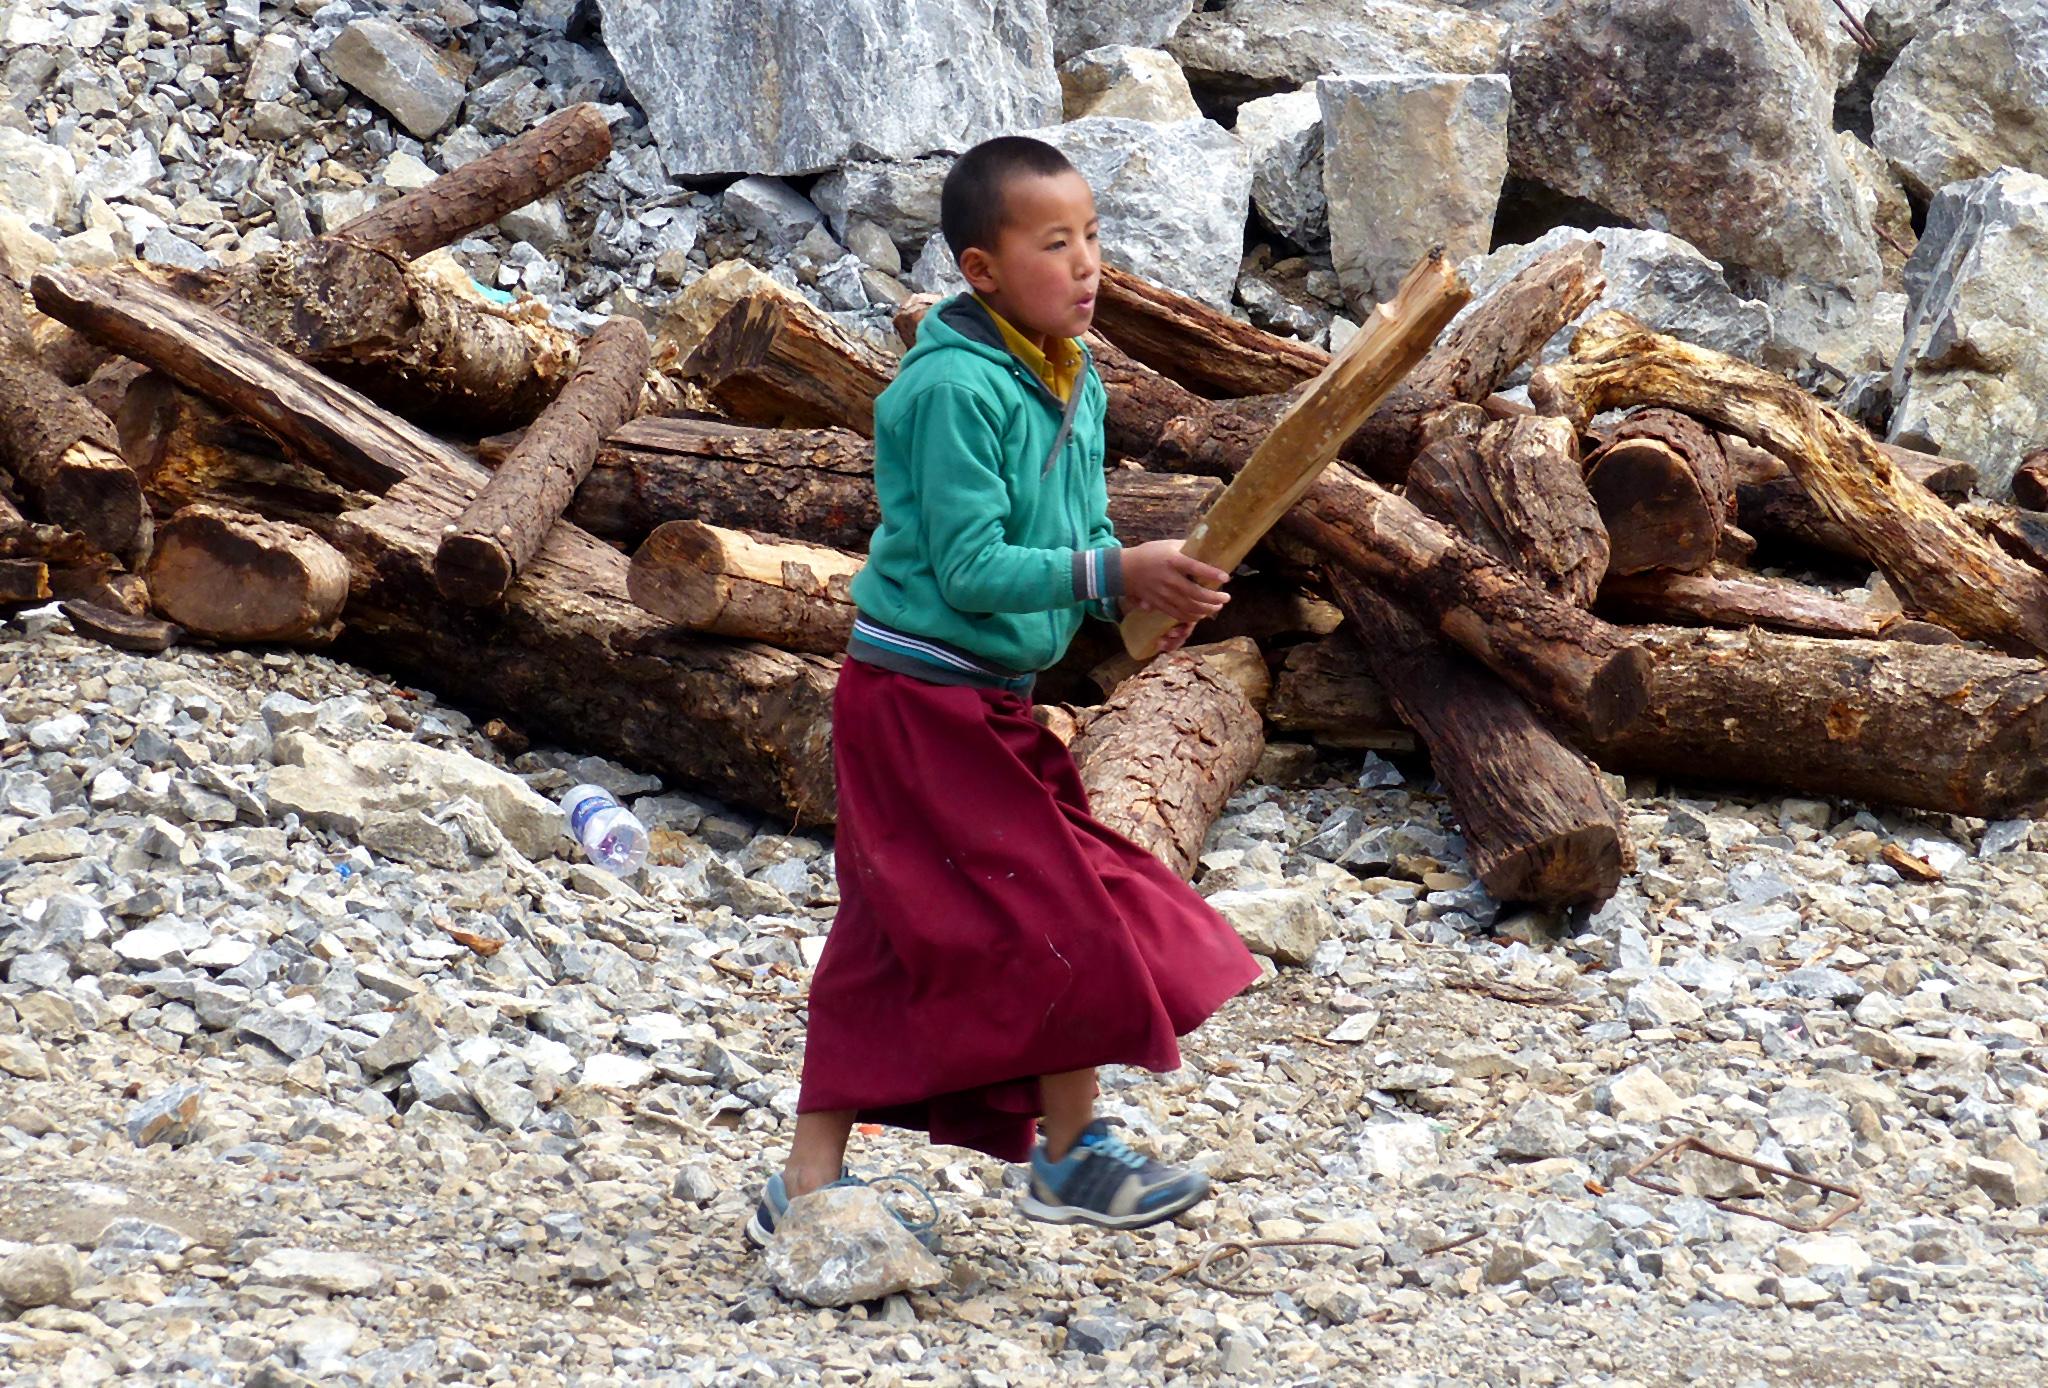 Enfant moine